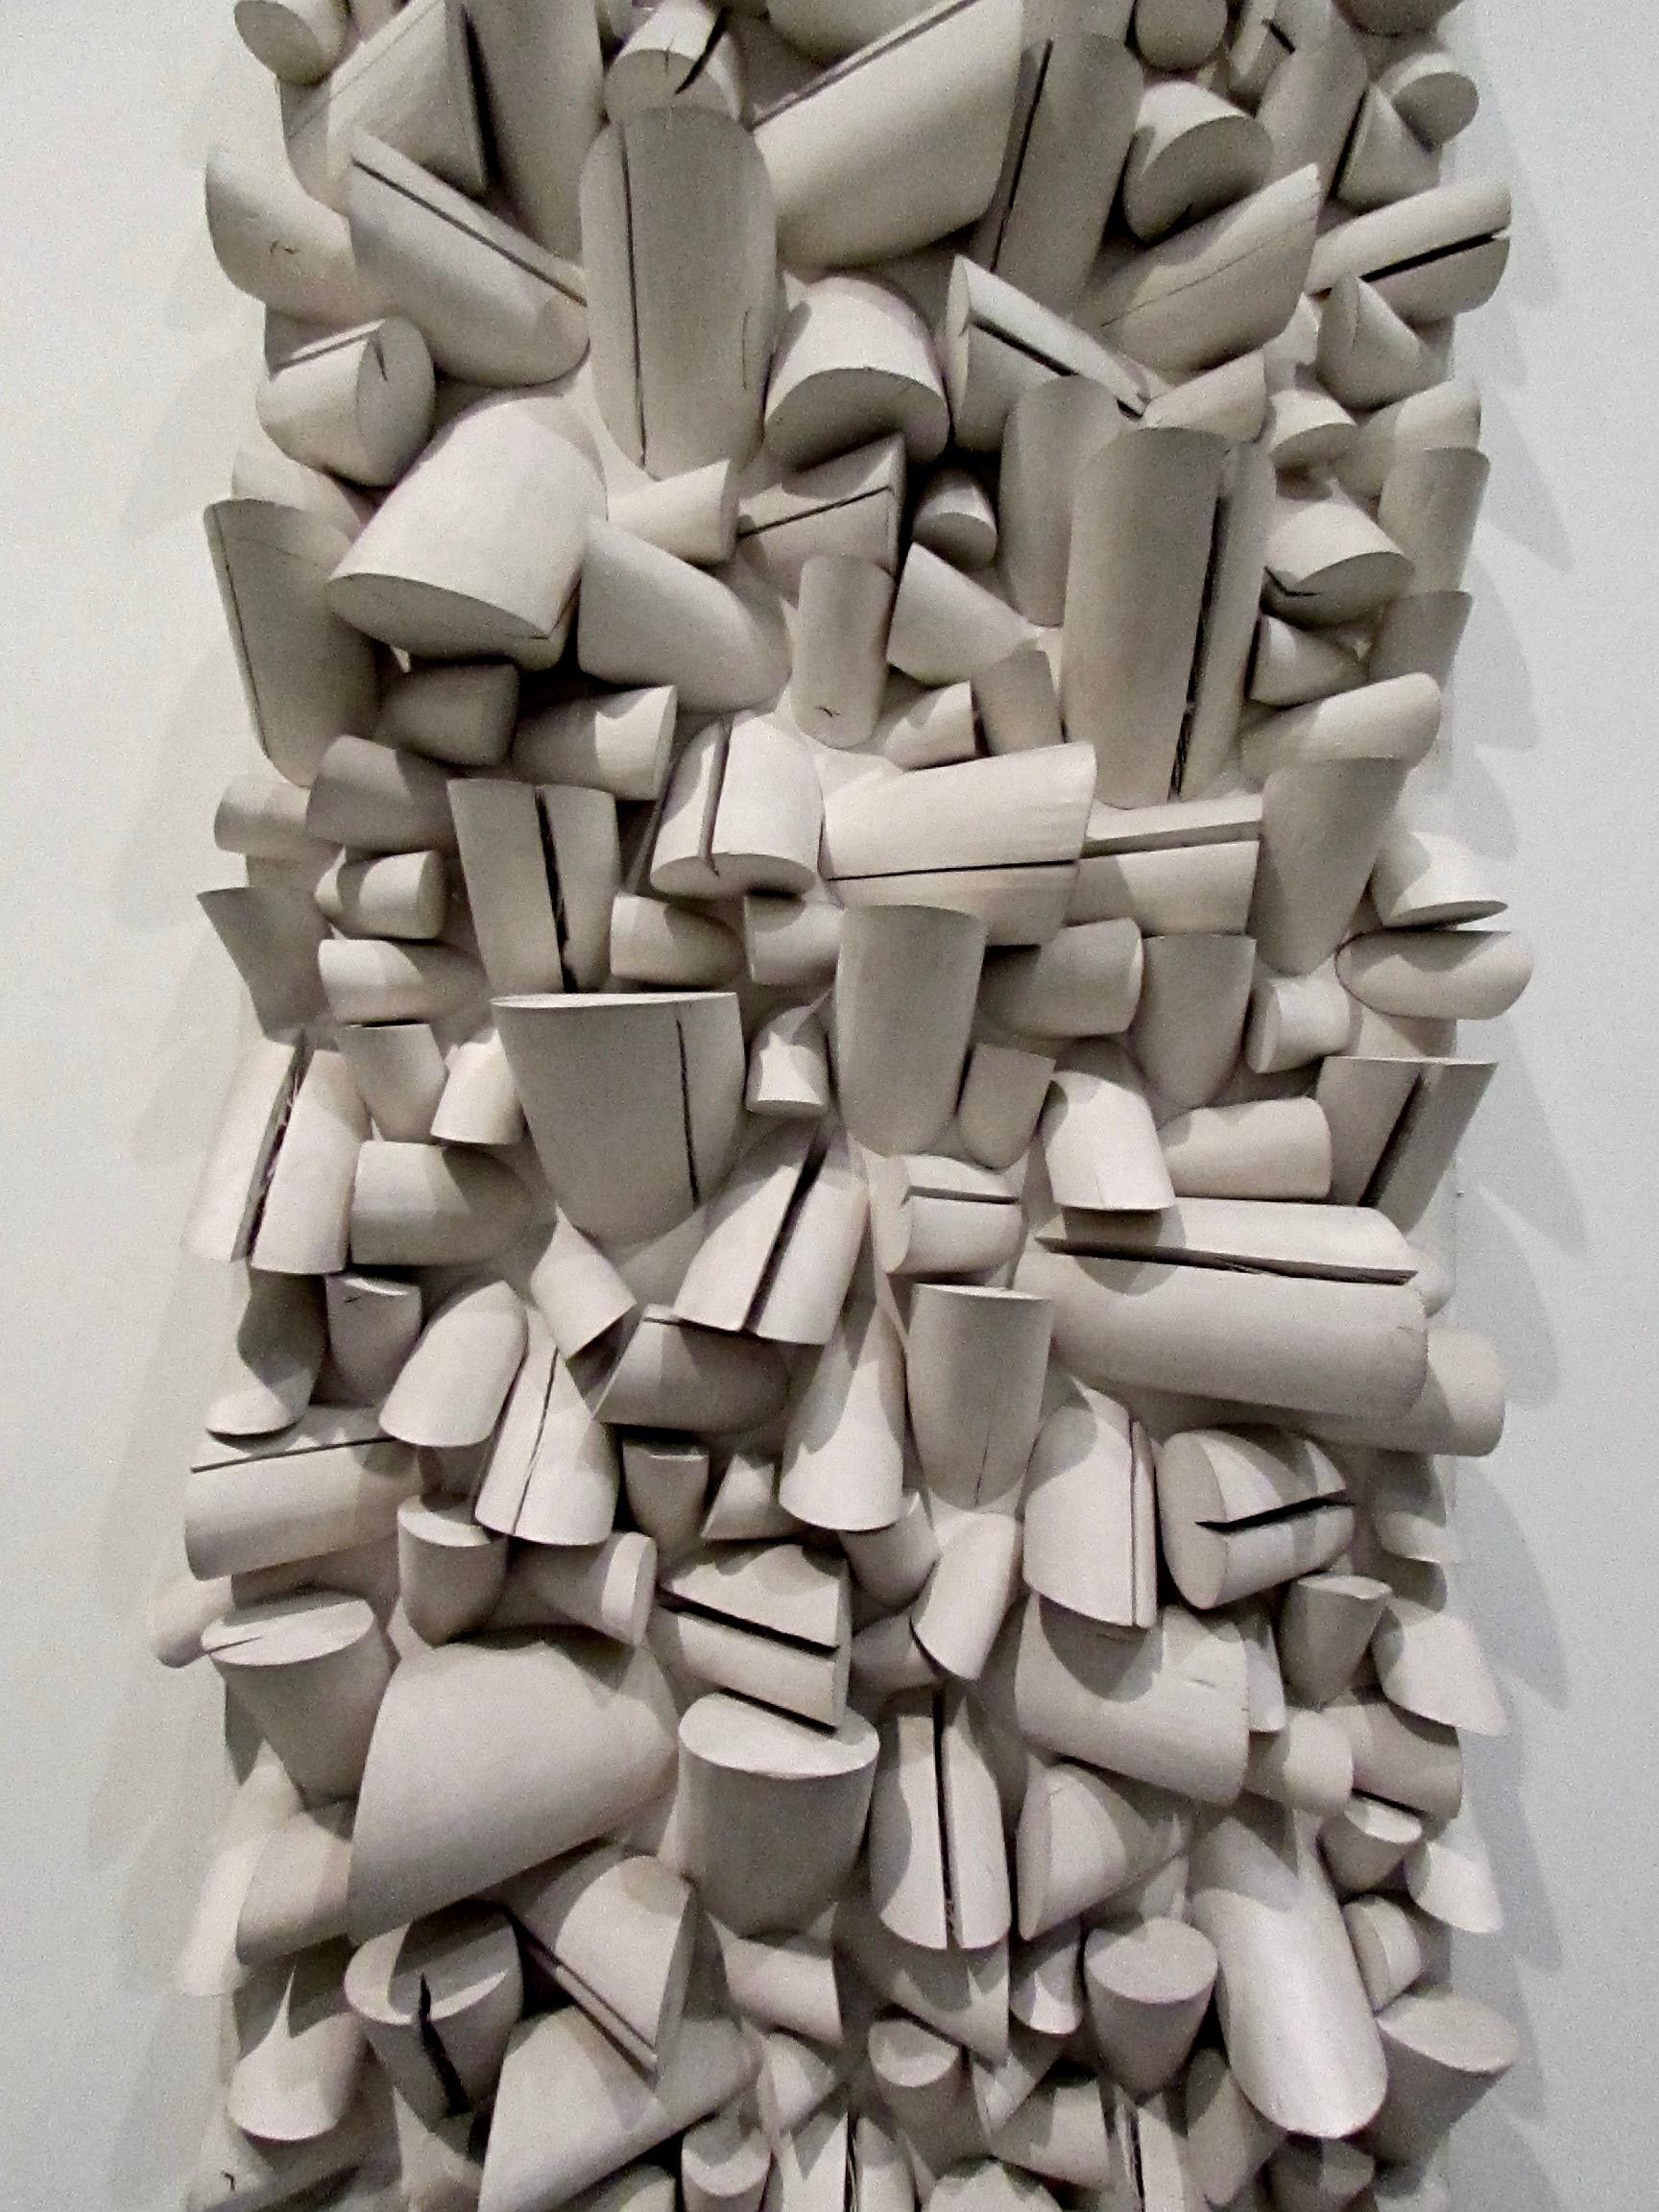 Large Split Relief No. 34/4/74  by Brazilian artist Sergio Camargo, 1964-5